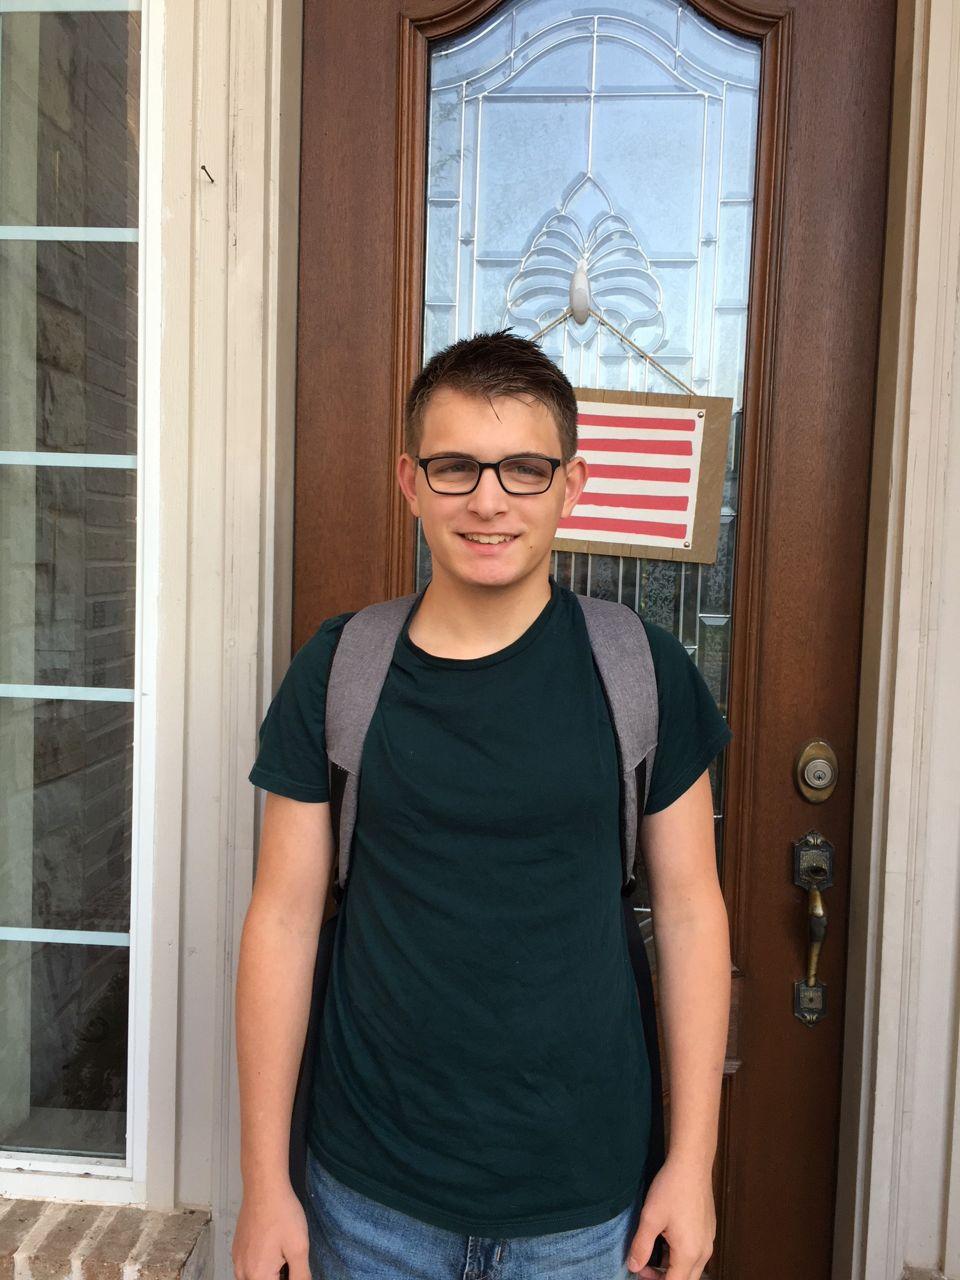 Graham is starting 9th grade.